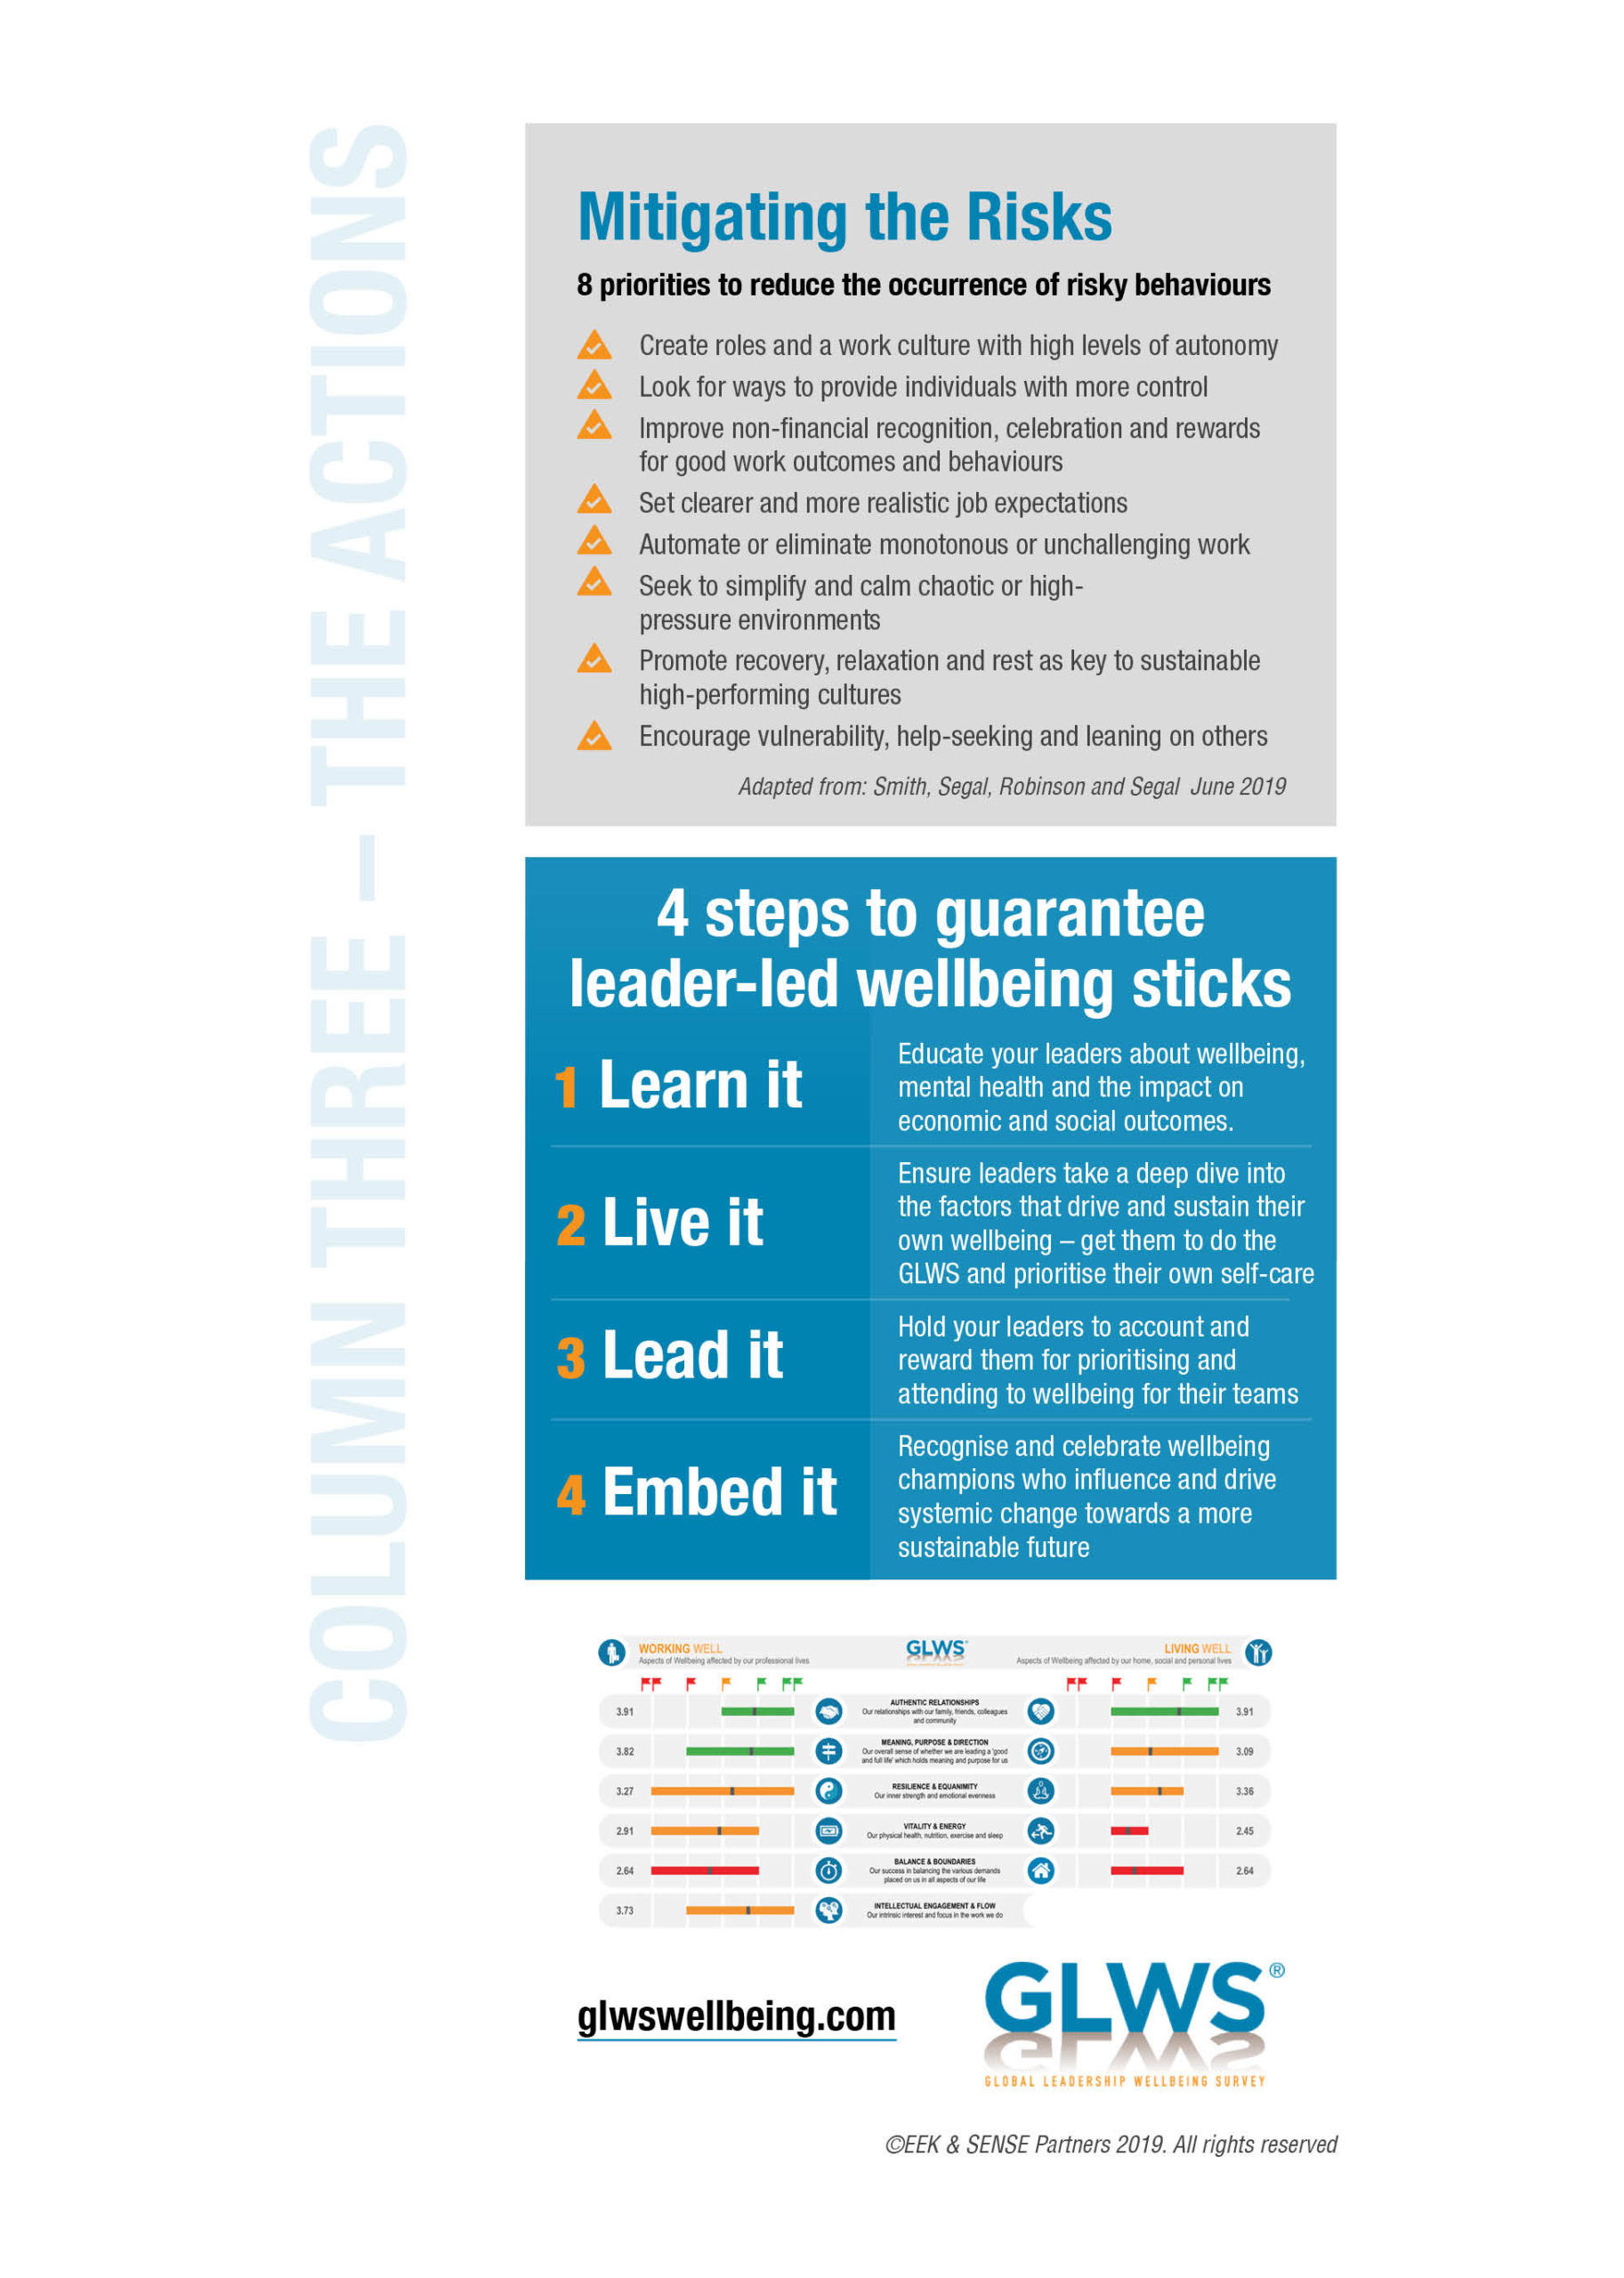 Select Wellness | GLWS risks